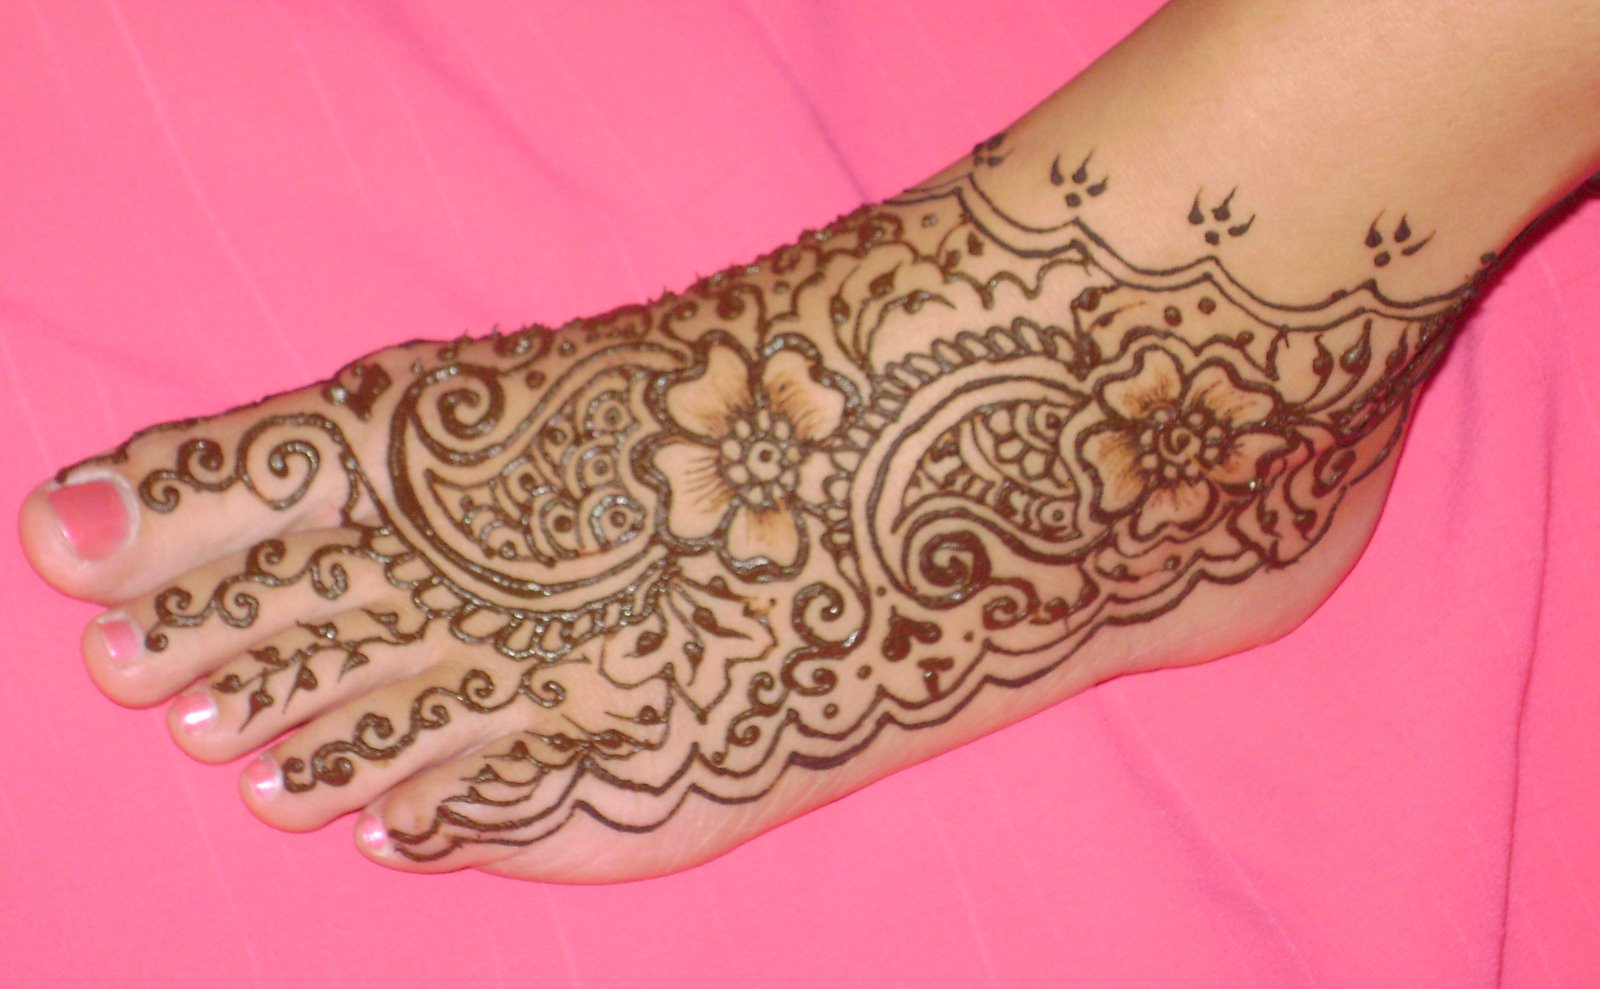 Simple Mehndi Henna Designs Legs : Traditional and simple round mehndi designs